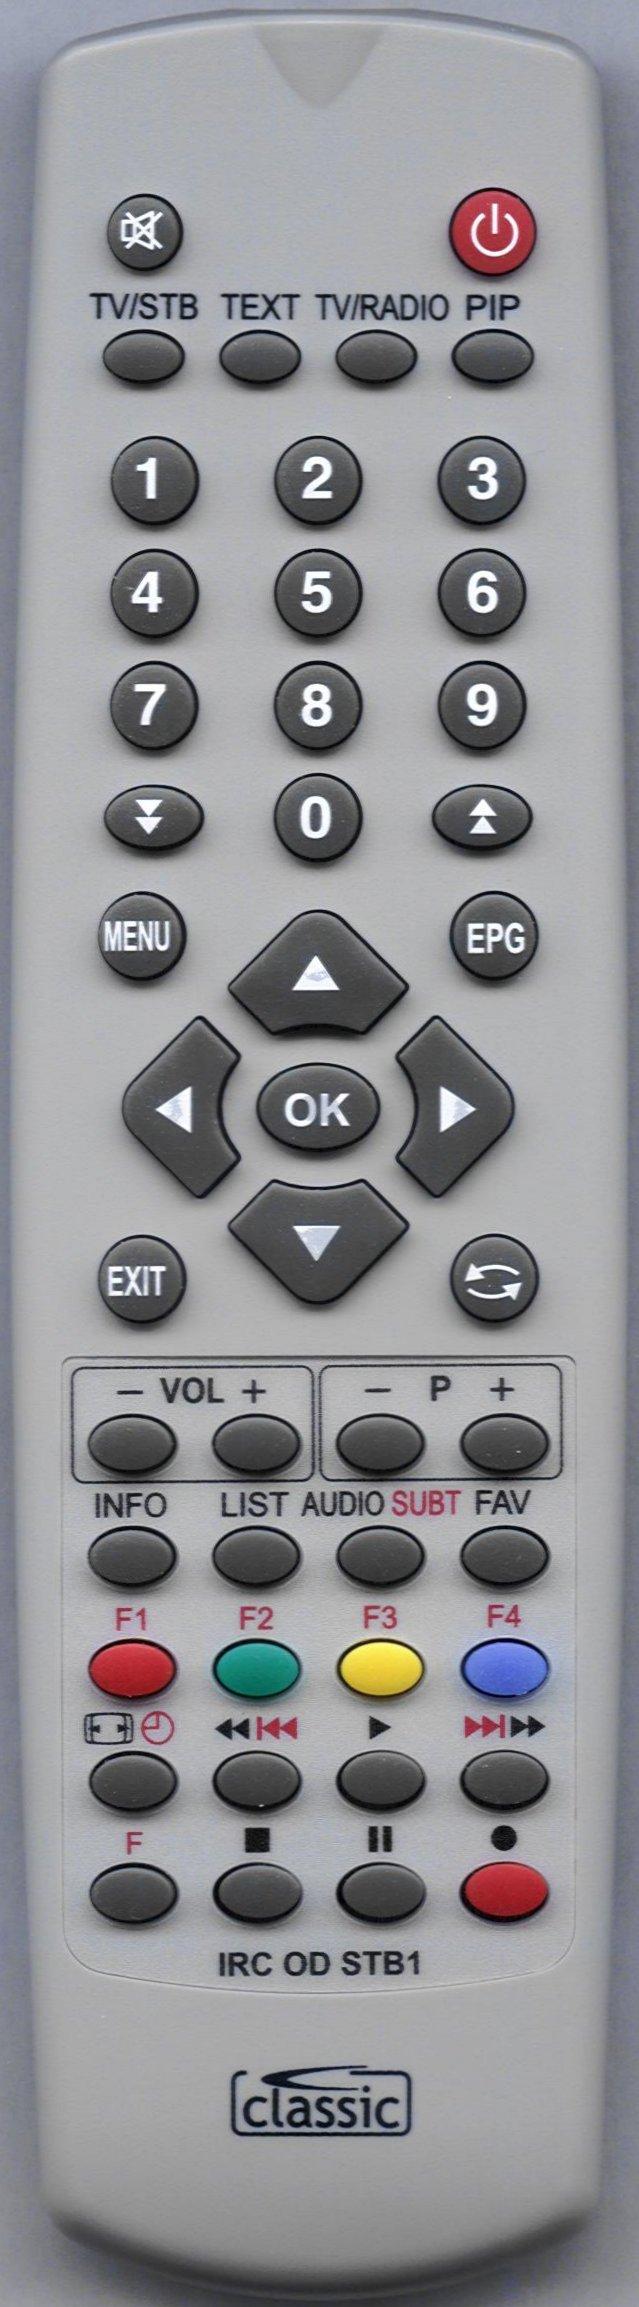 TECHNOMATE TM-5200 D USB Remote Control